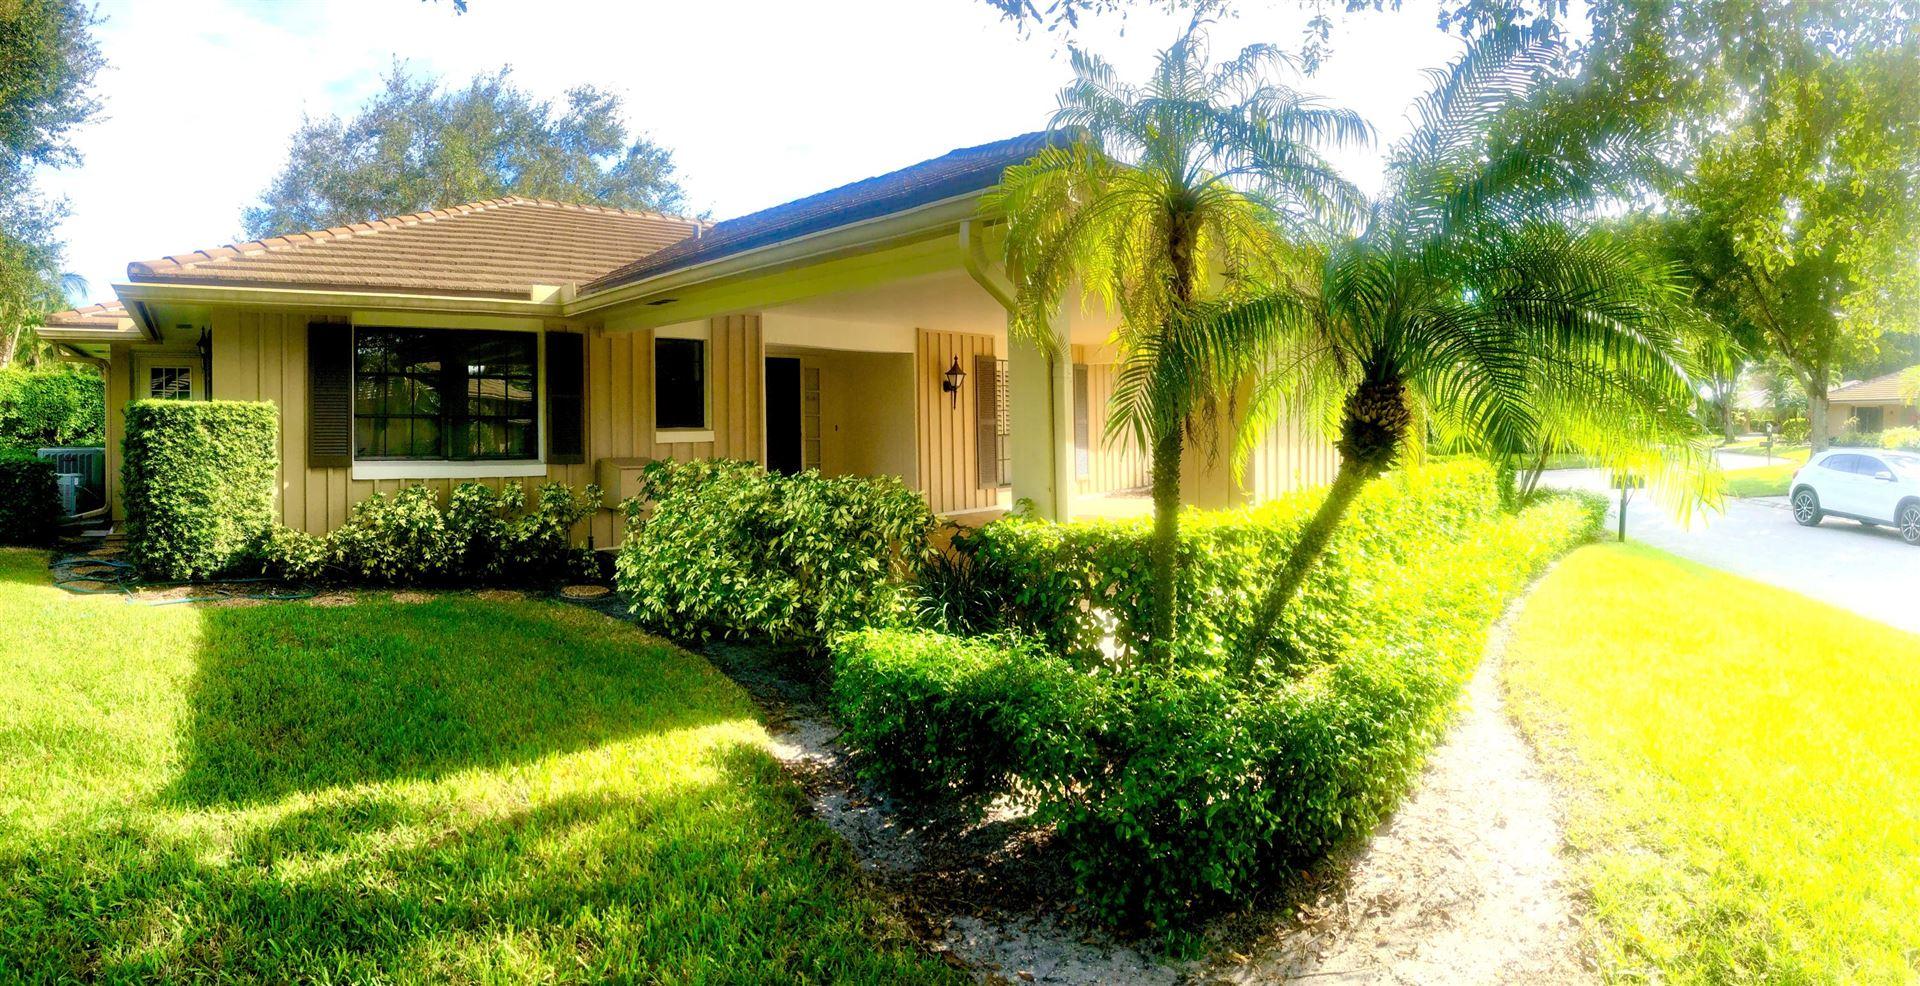 Photo of 712 Muirfield Circle, Atlantis, FL 33462 (MLS # RX-10676151)